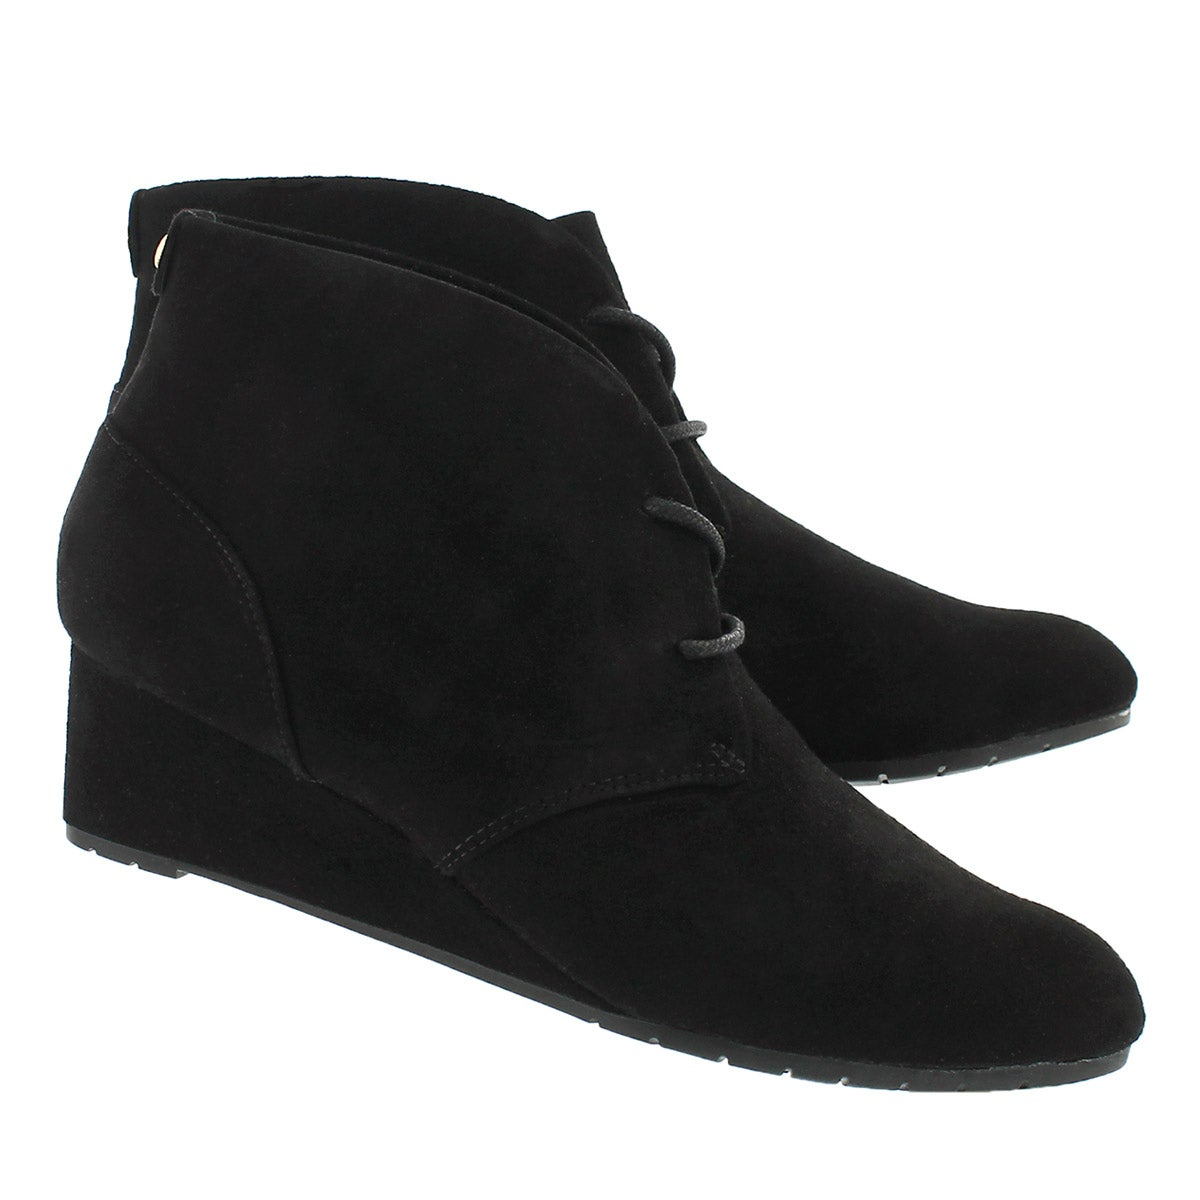 Lds Vendra Peak black lace up wedge boot